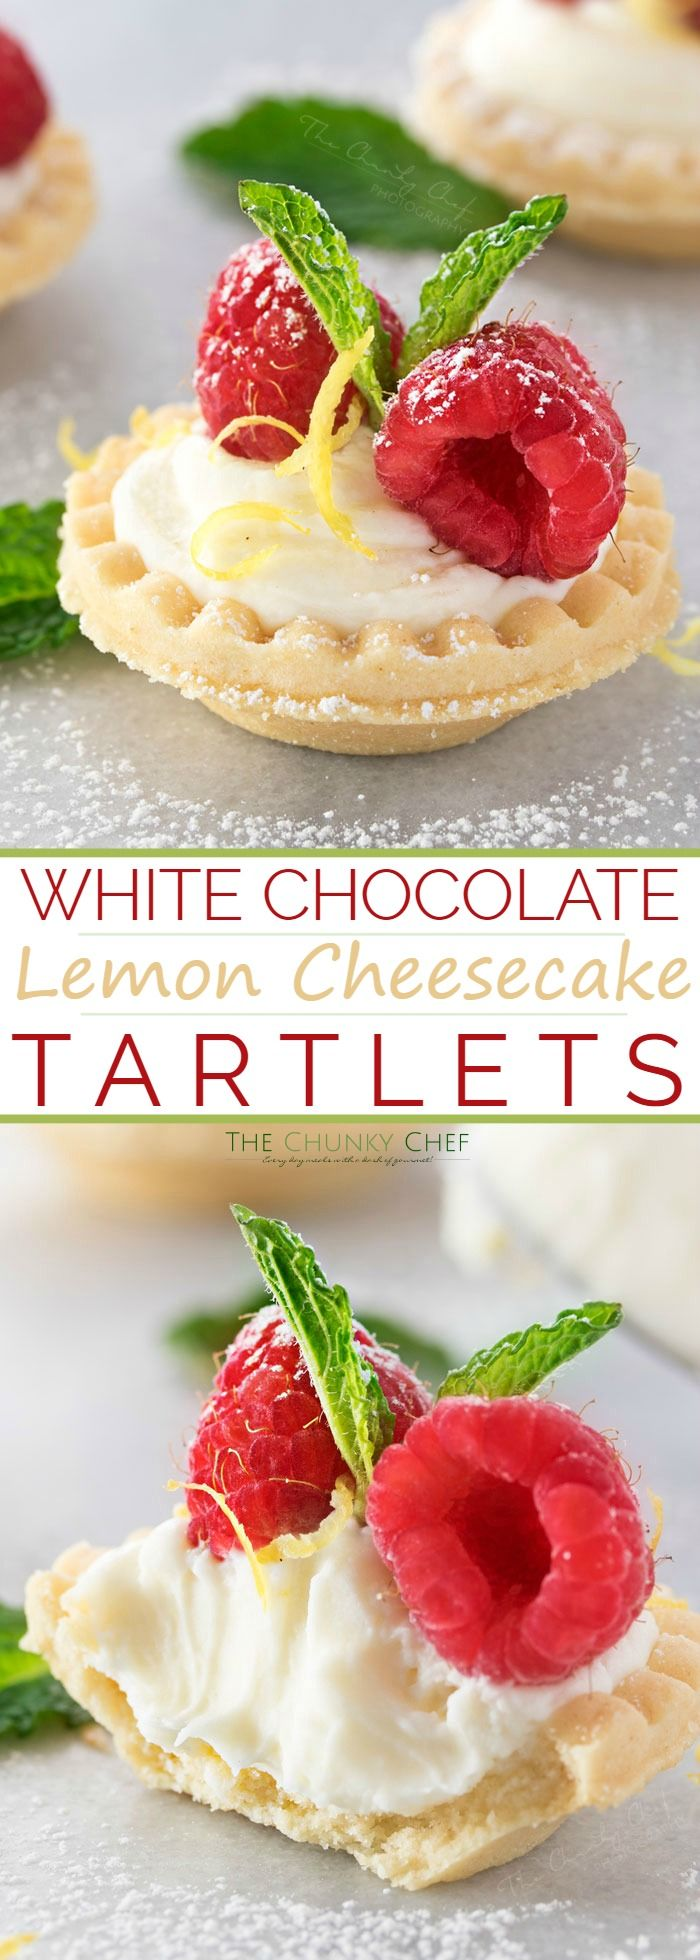 Mini No Bake White Chocolate Lemon Cheesecake Tarts